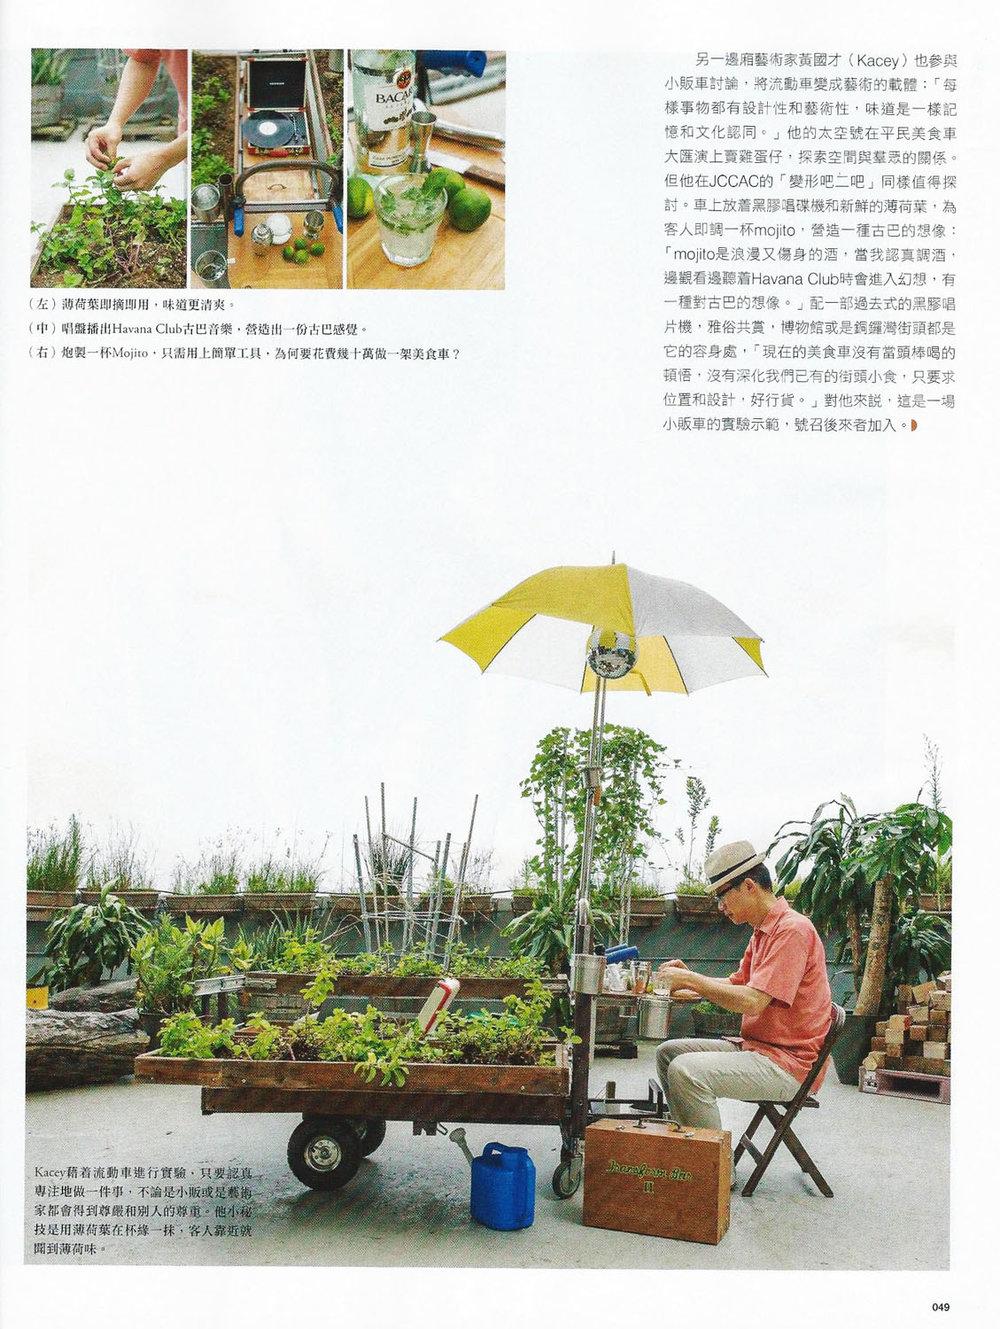 June/18/2016 明報周刊